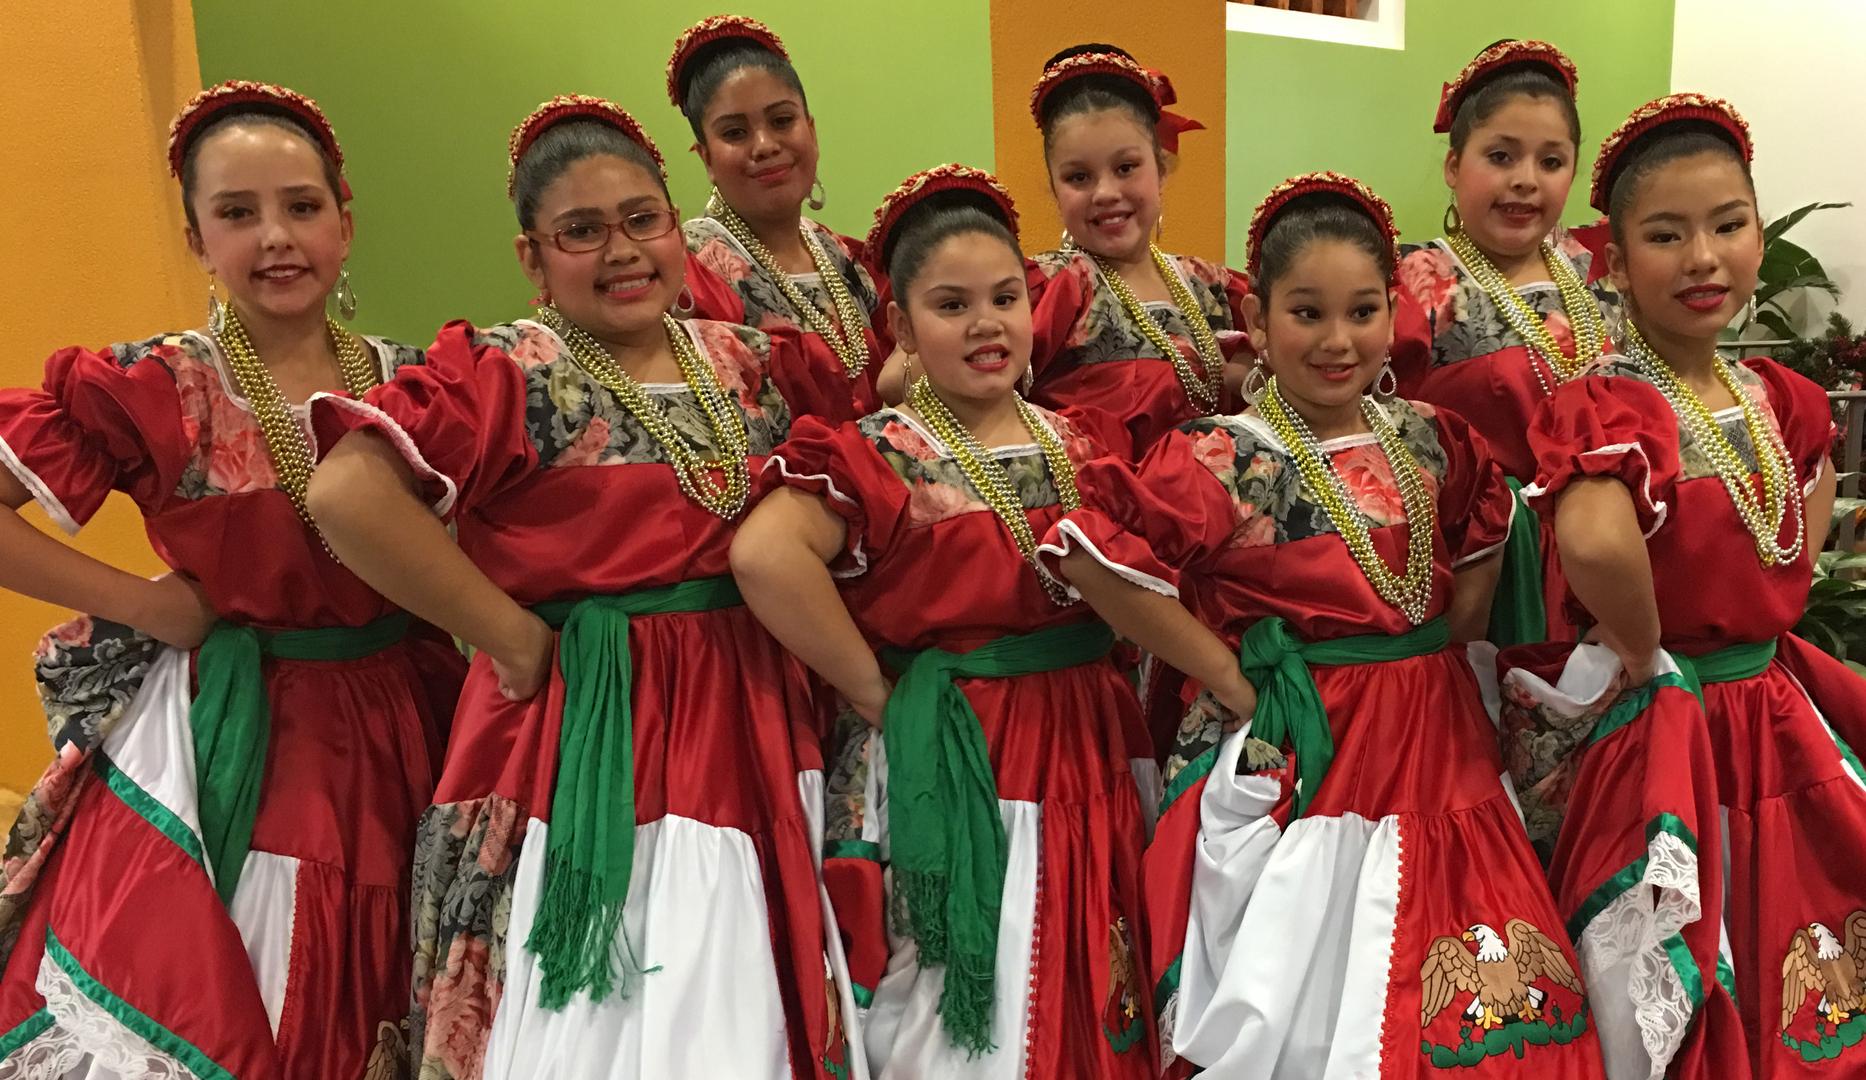 mexico 2000 ballet folklorico dance classes ballet folklorico